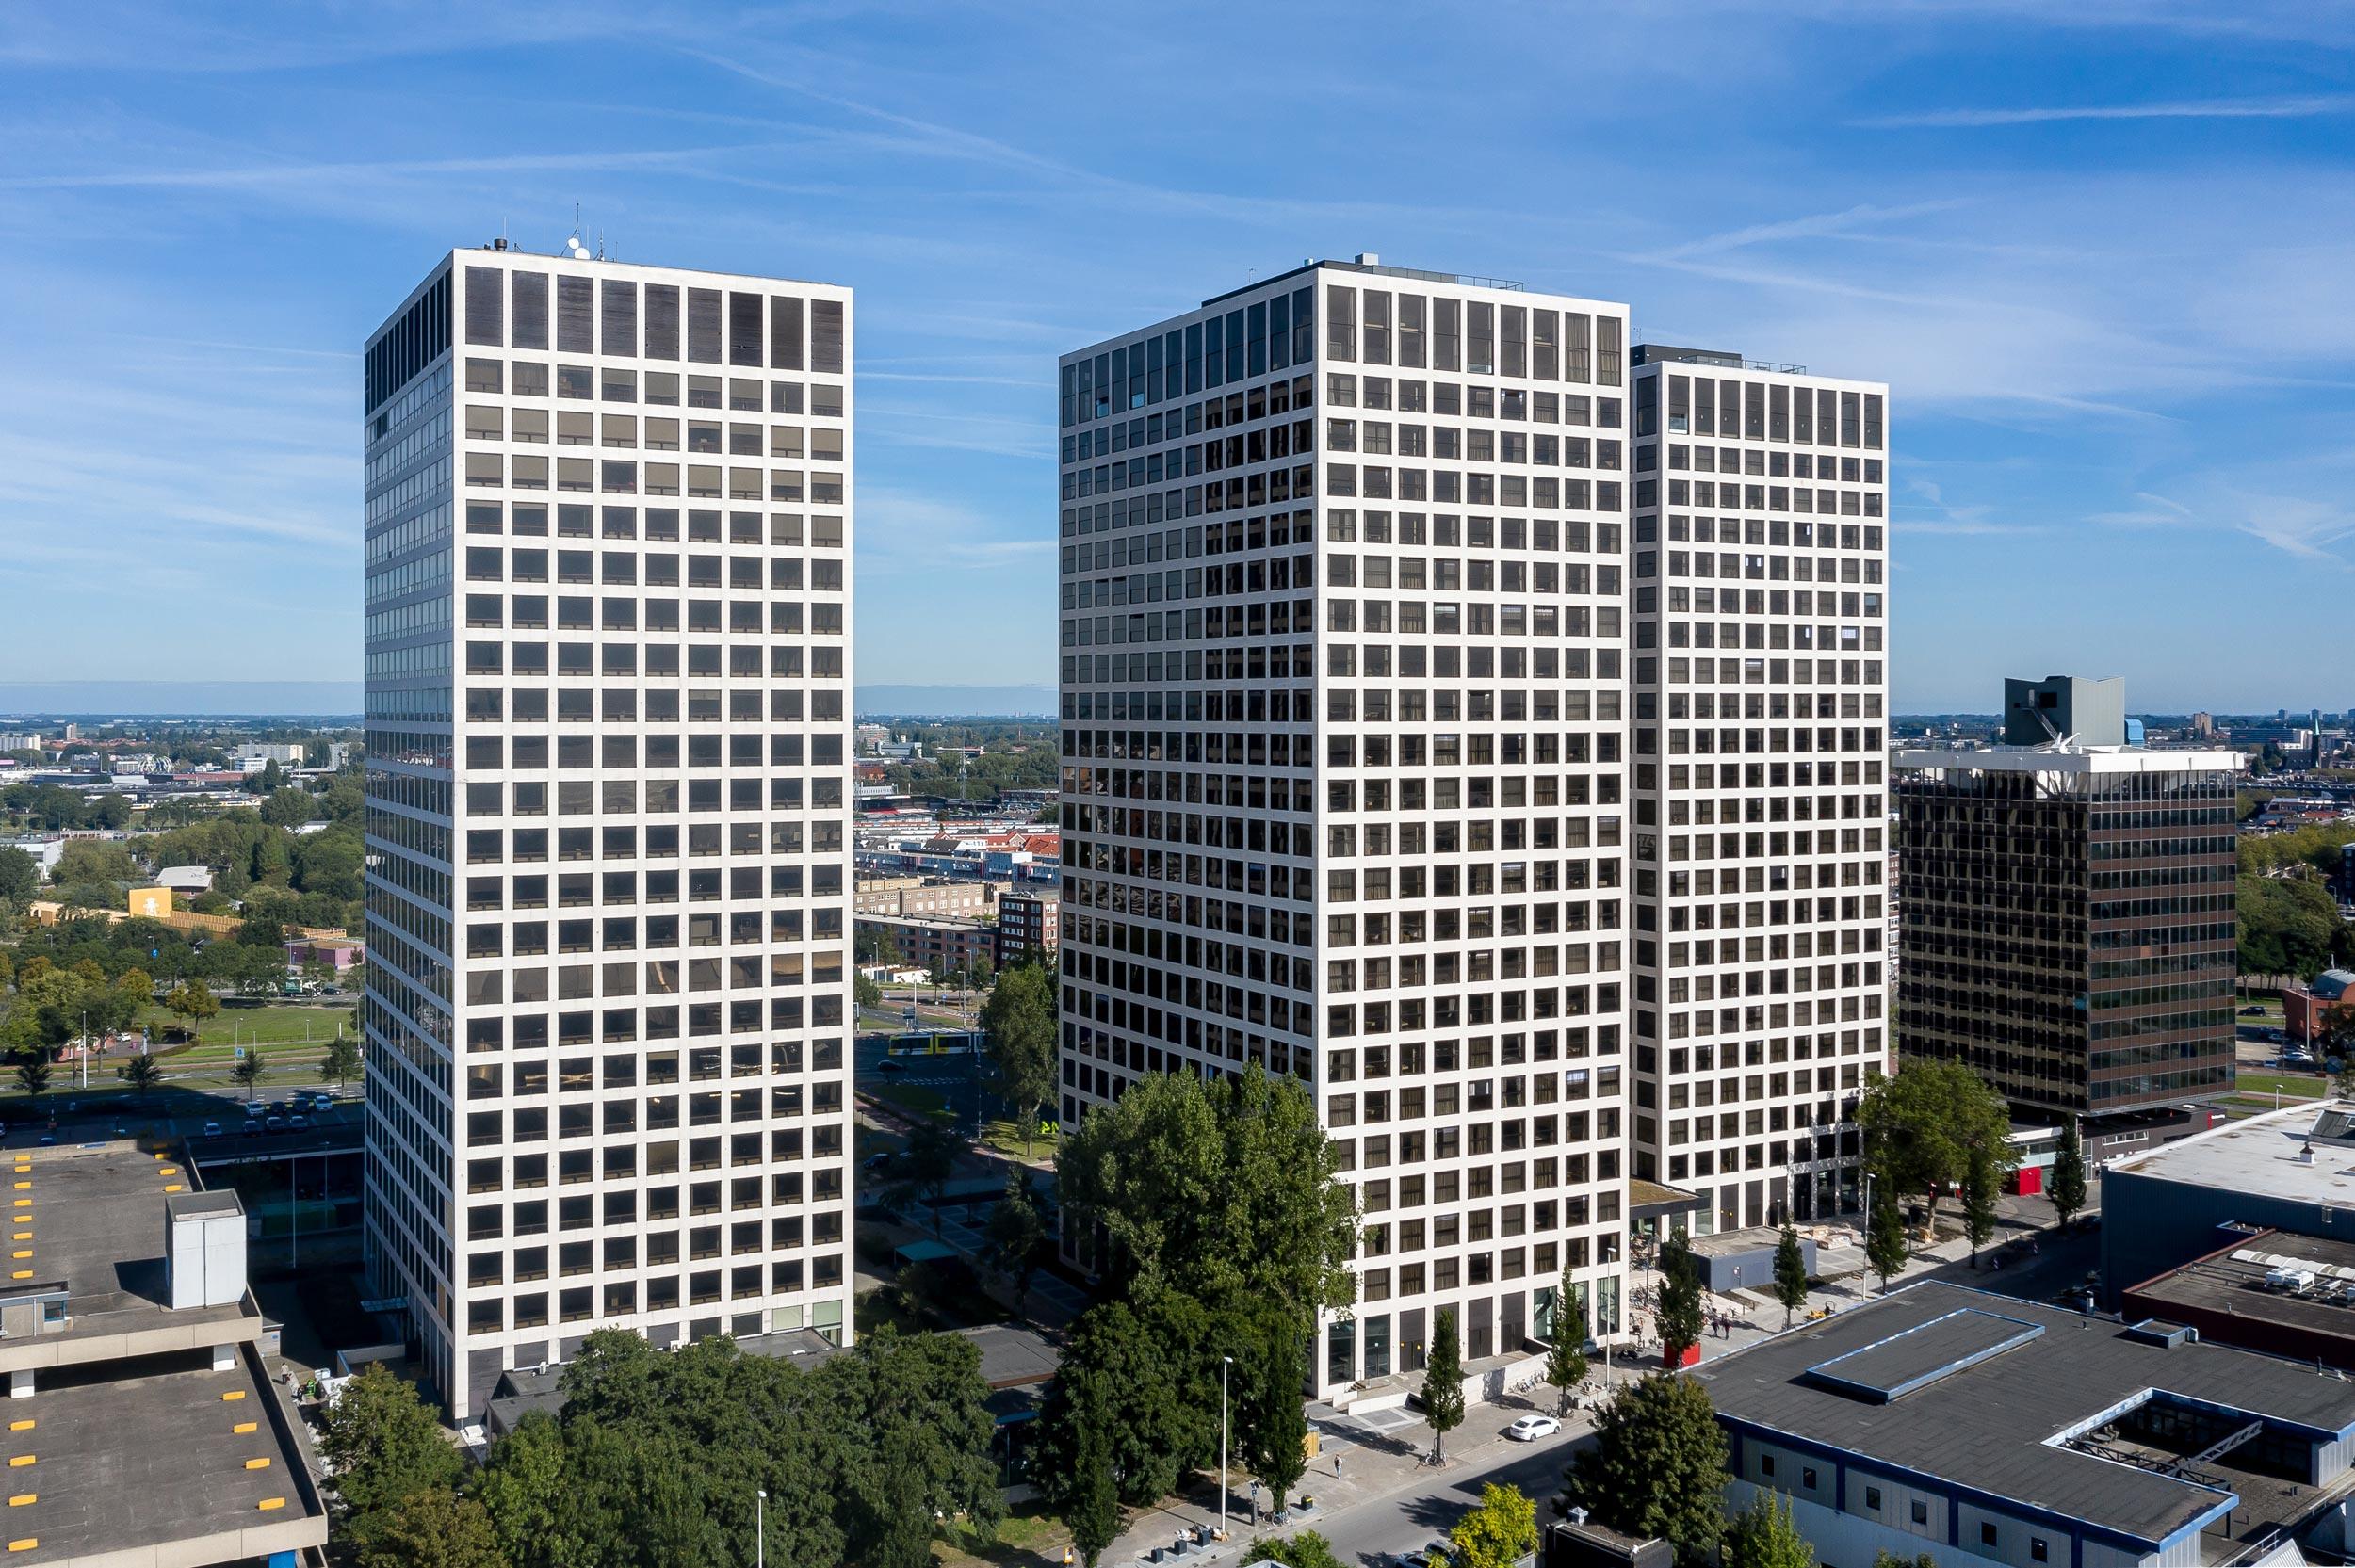 004-VB-Ossip-van-Duivenbode-Lee-Towers